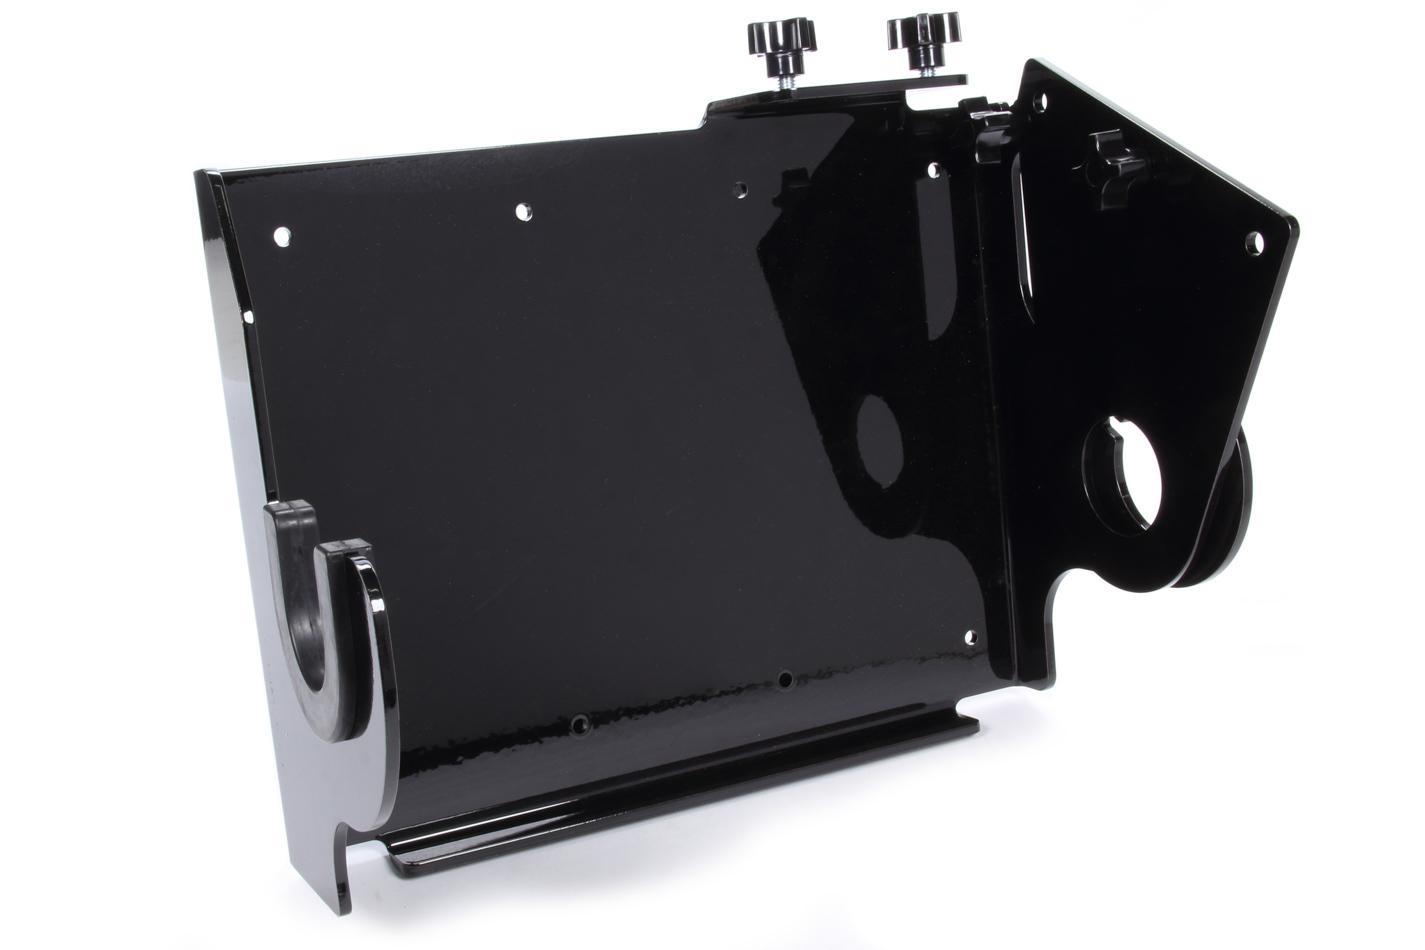 Hepfner Racing Products HRP6780-3-BLK Steering Box Rack, Wall Mount, Aluminum, Black Powder Coat, Each